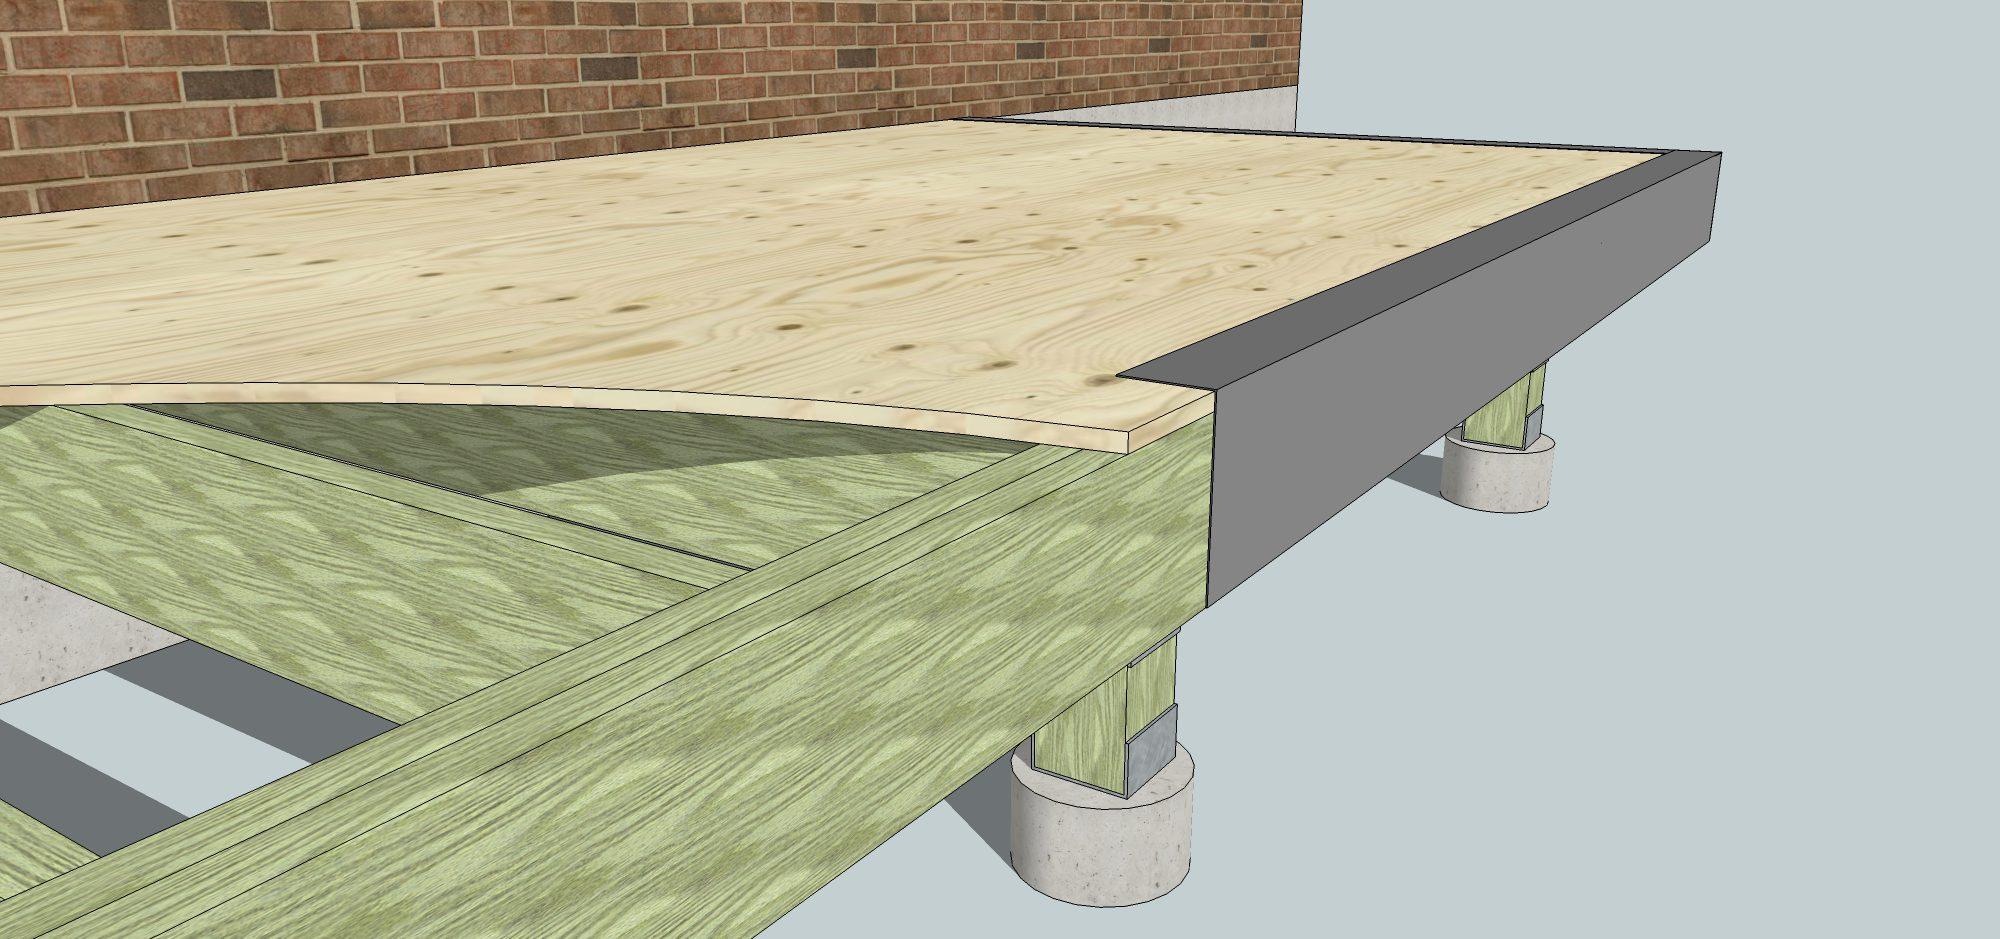 Sunroom Deck Flashing